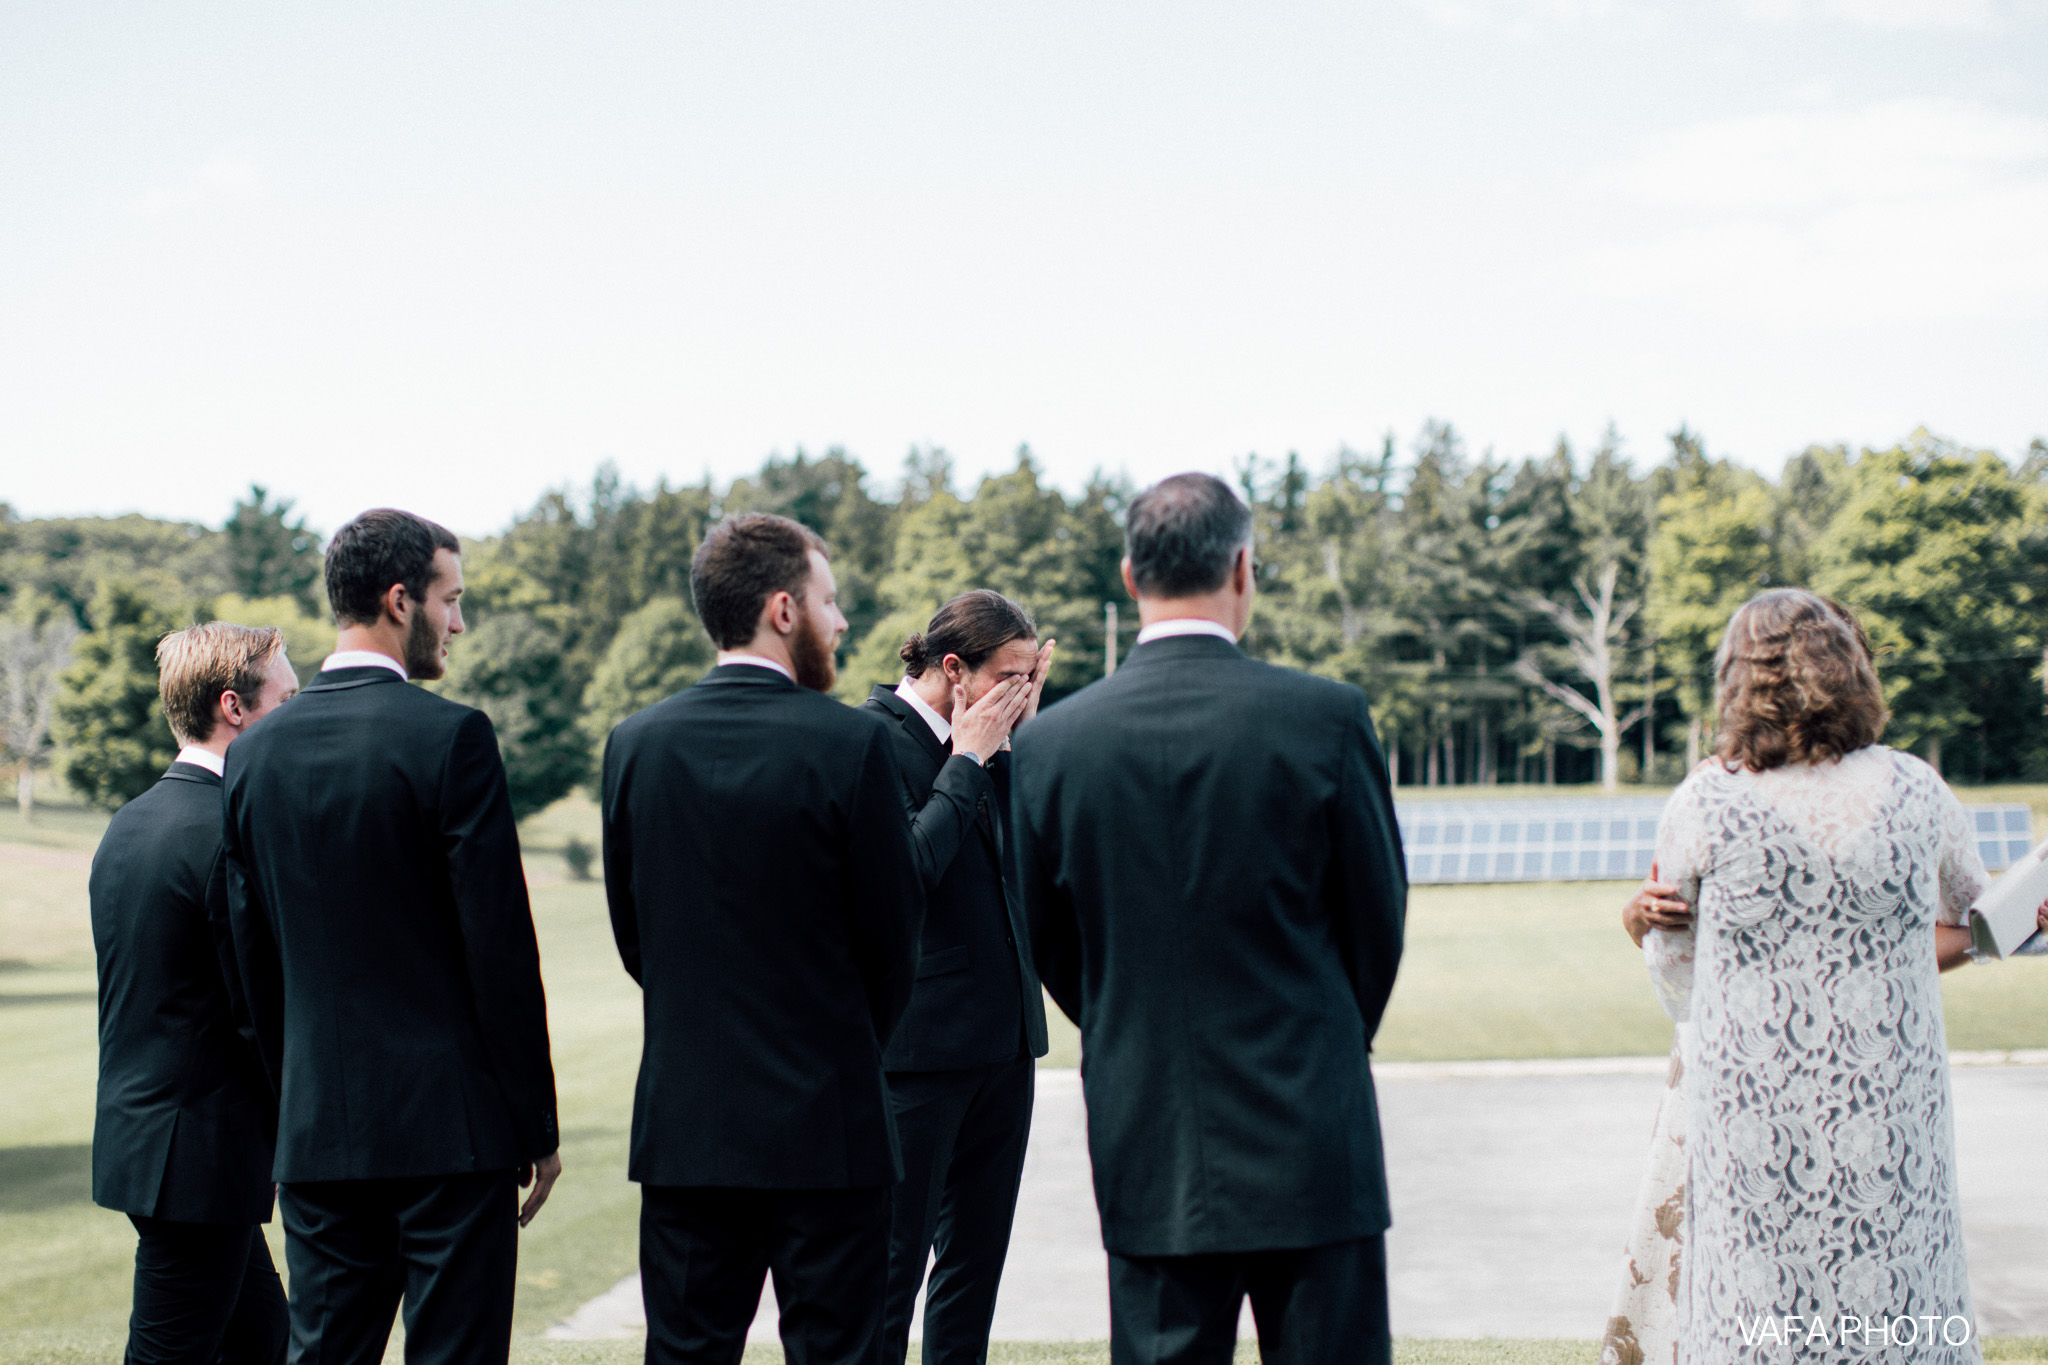 The-Felt-Estate-Wedding-Kailie-David-Vafa-Photo-211.jpg